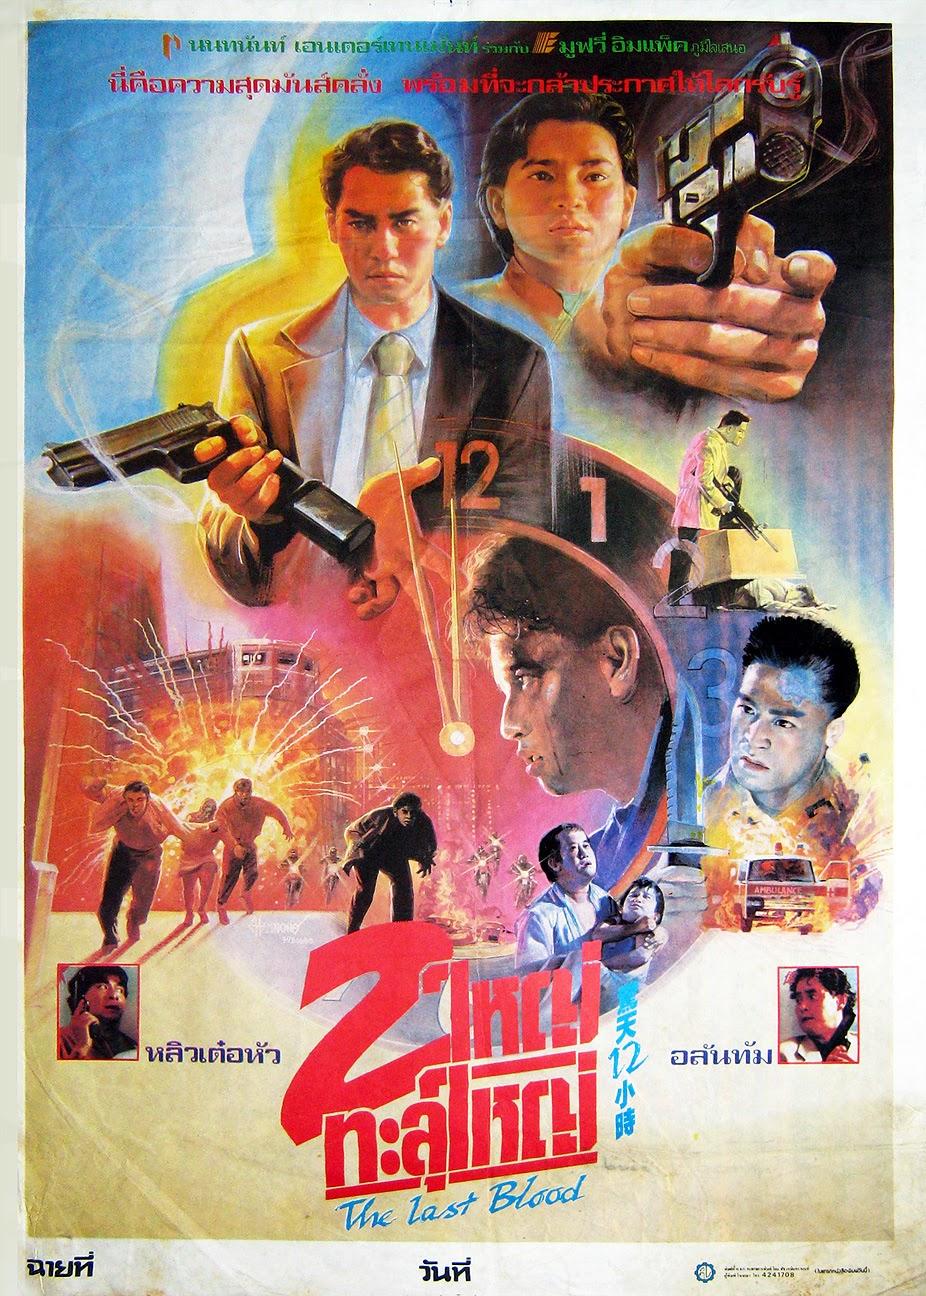 Kung Fu Movie Posters The Last Blood Jing Tian 12 Xiao Shi 1991